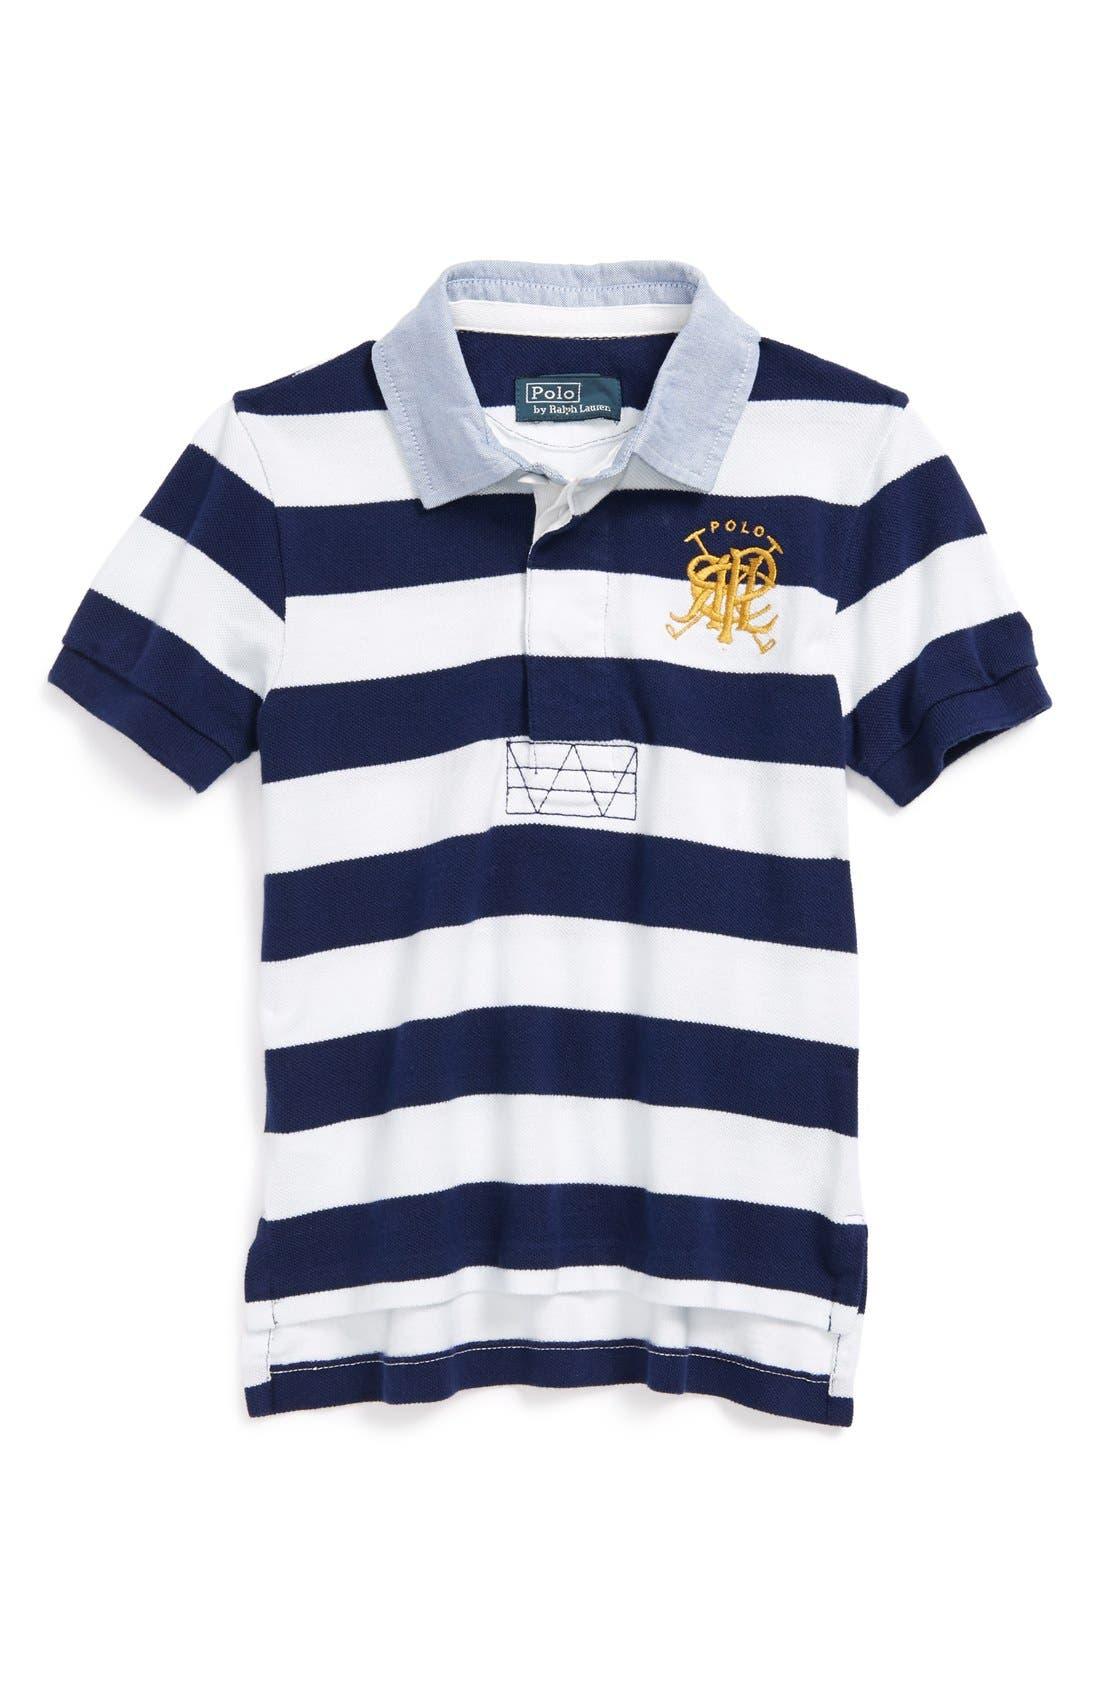 Alternate Image 1 Selected - Ralph Lauren Striped Polo (Toddler Boys)